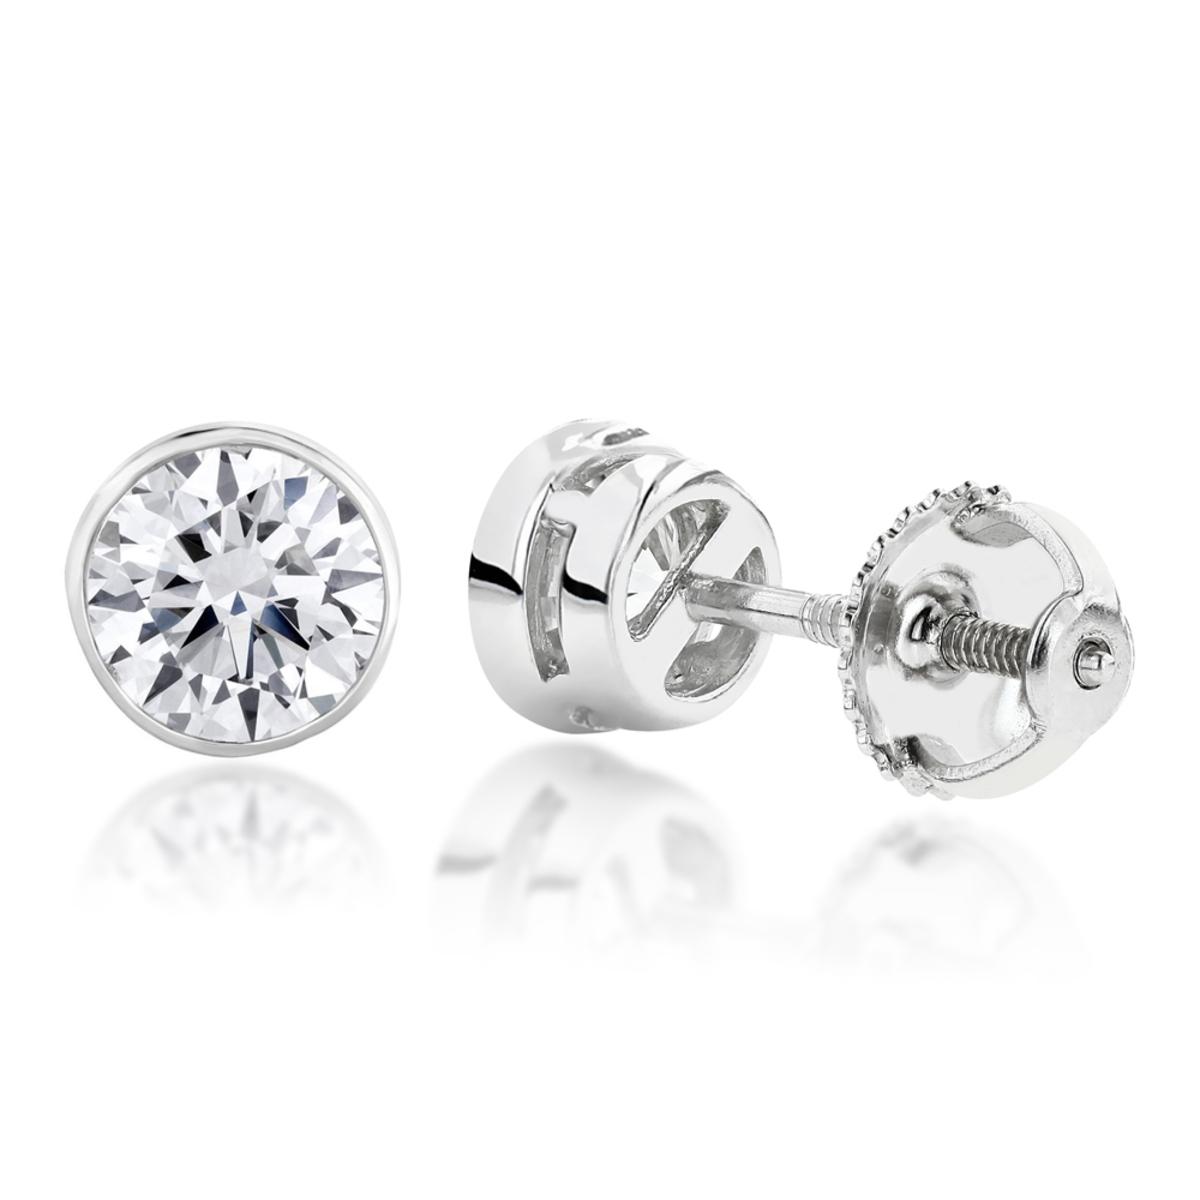 Two Carat 18K Gold Solitaire Round Diamond Bezel Stud Earrings